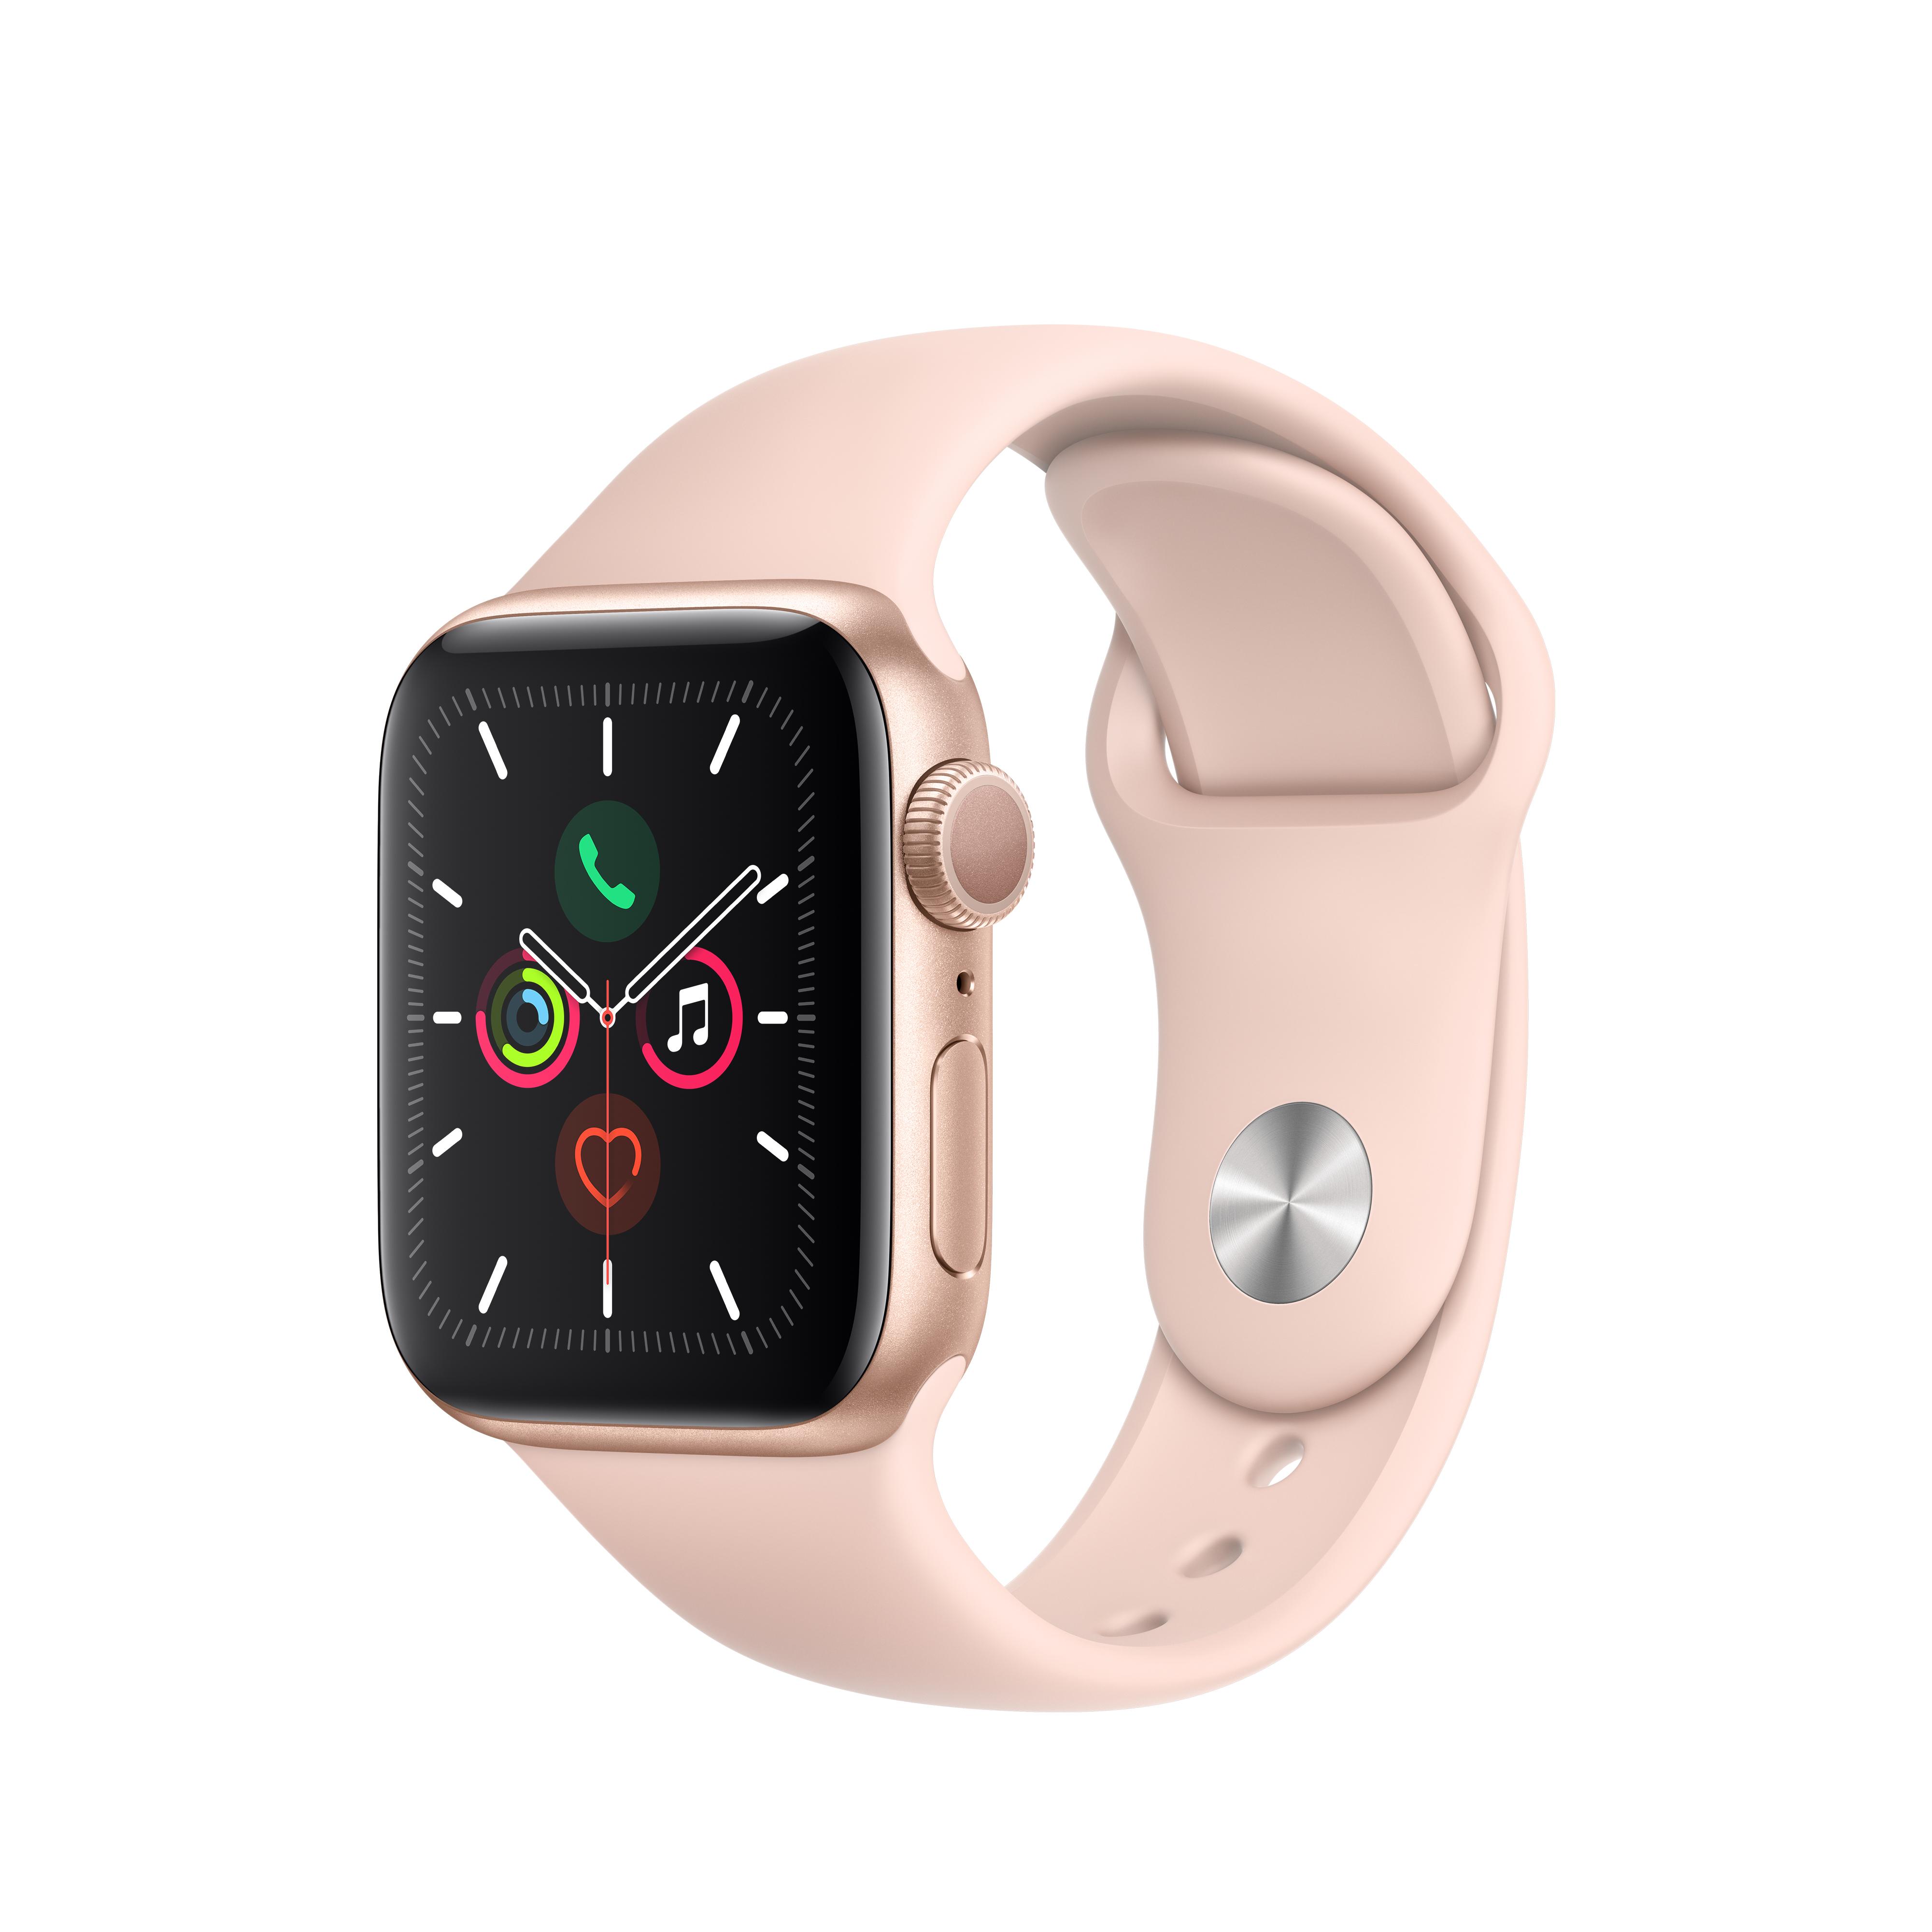 Apple 애플워치5 GPS 40mm 스포츠밴드 + 알루미늄케이스, 골드(MWV72KH/A), 핑크 샌드(밴드)